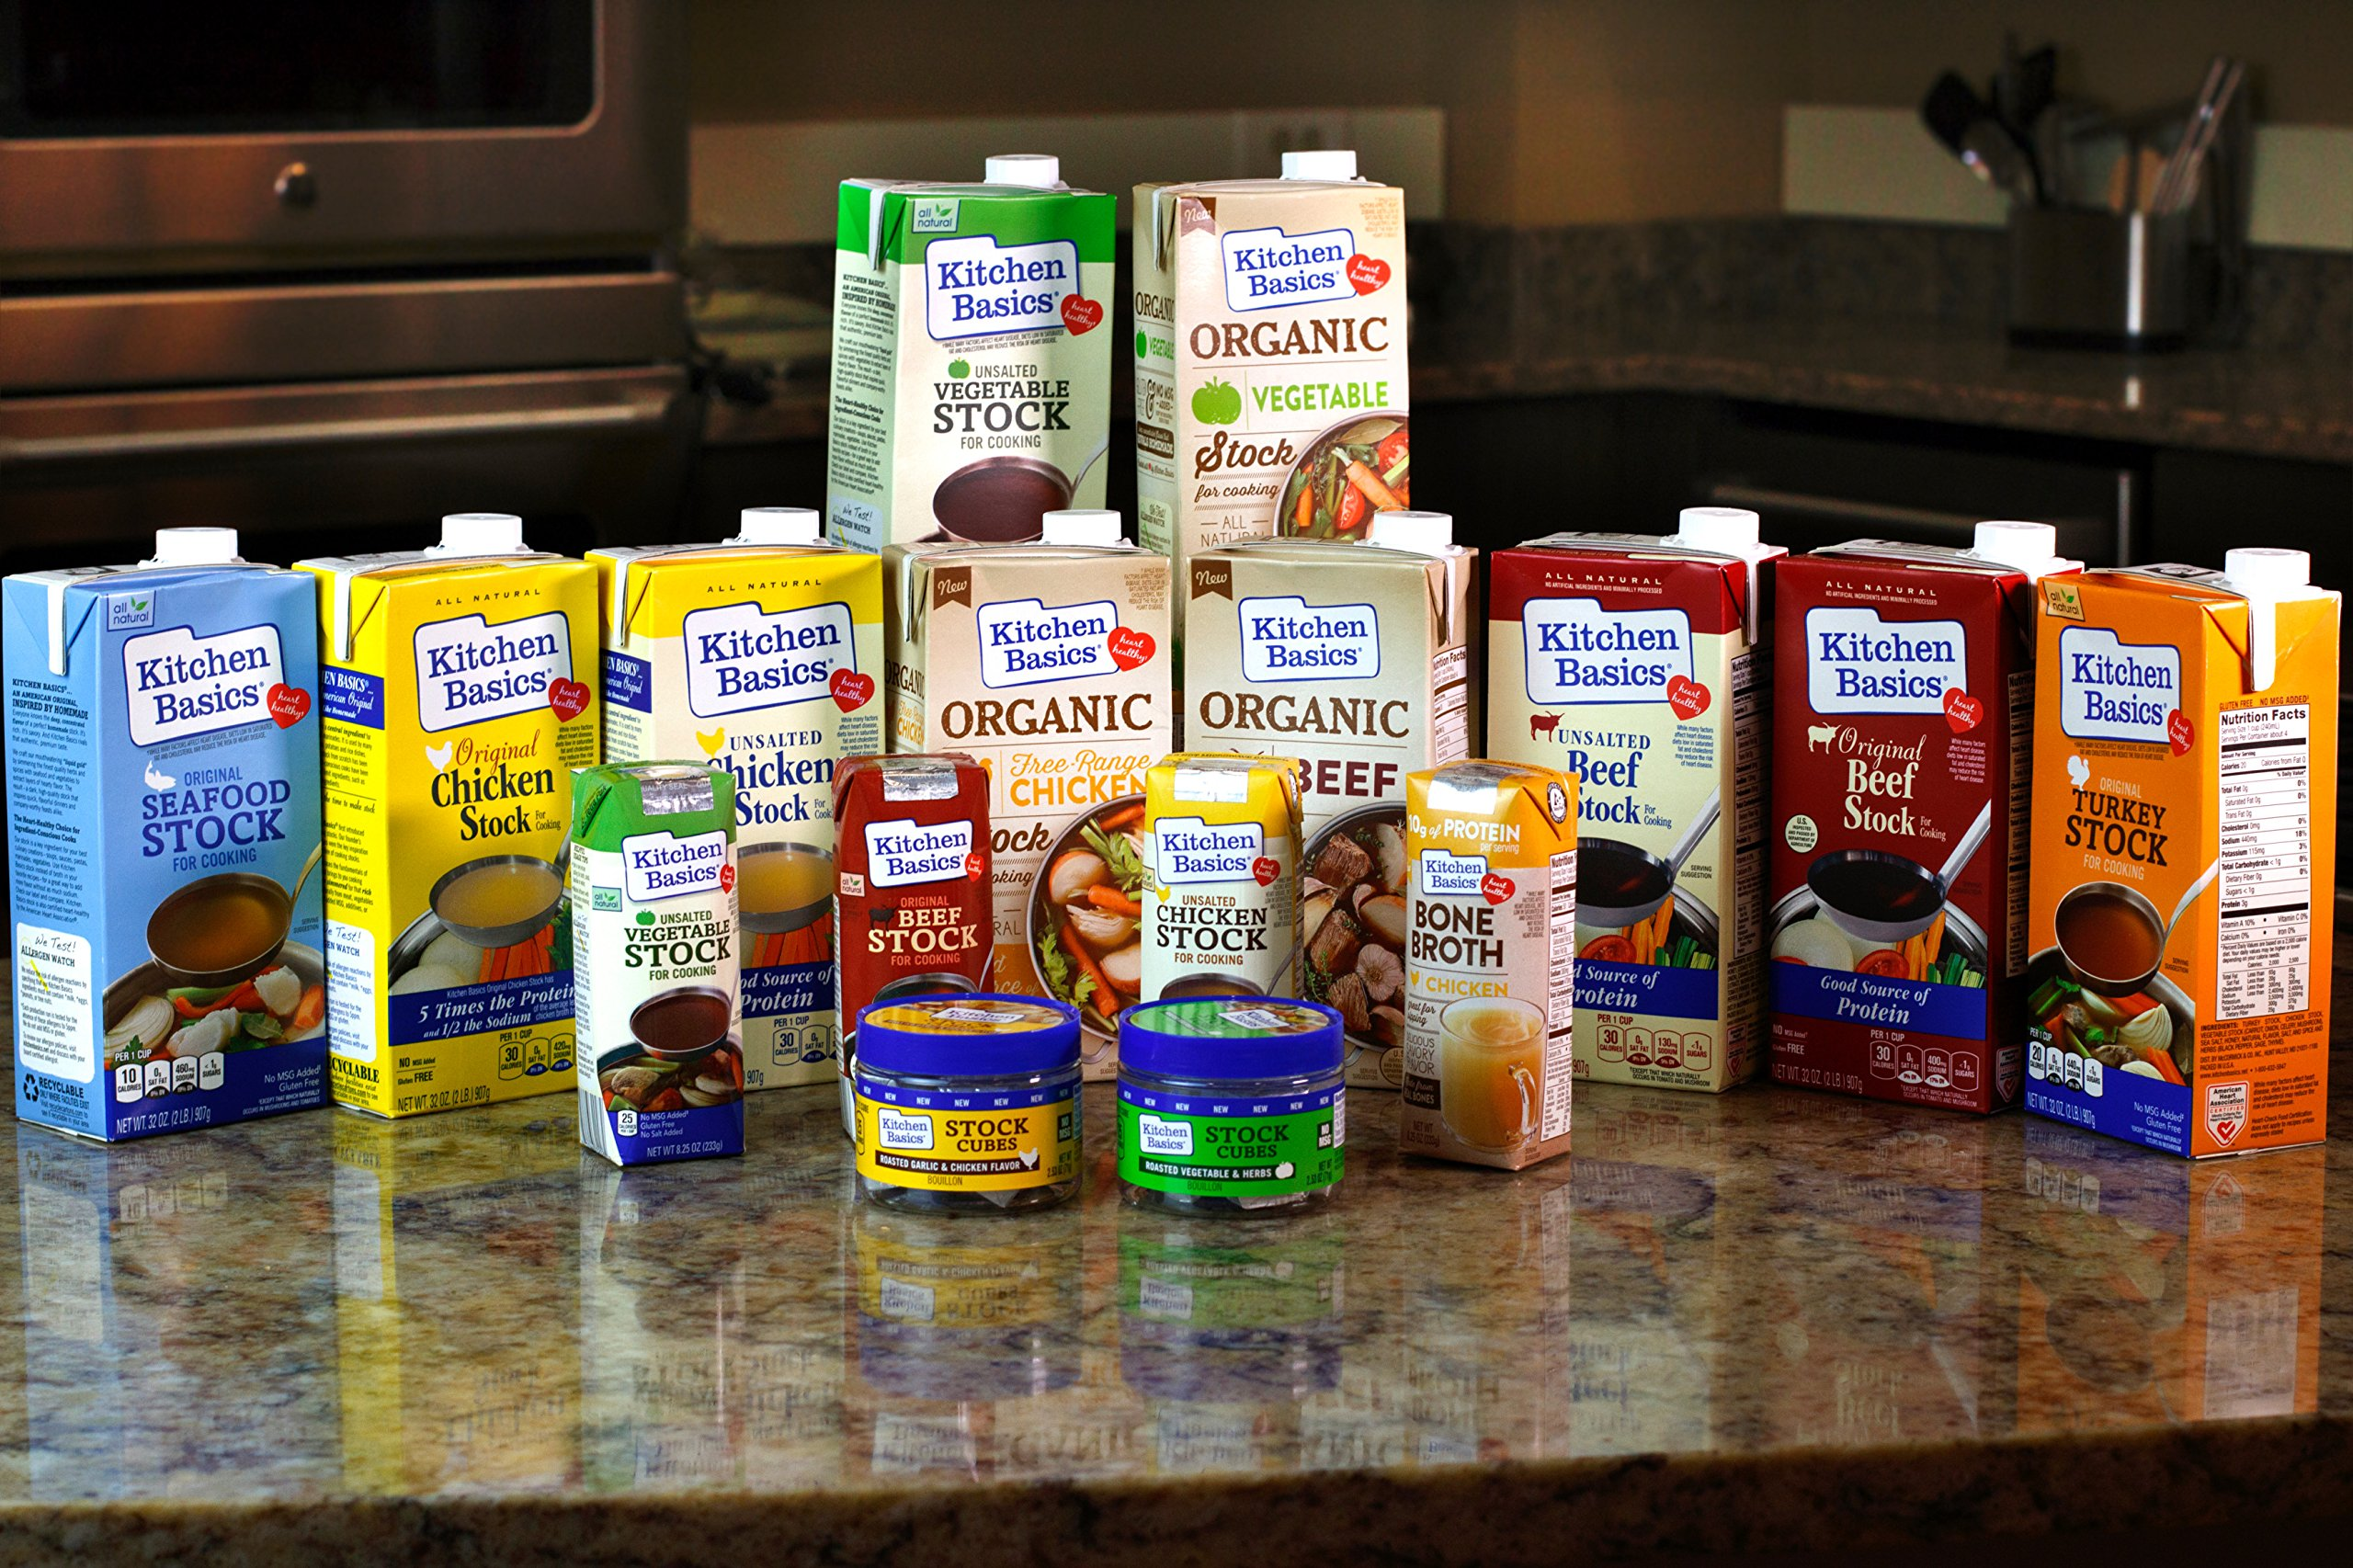 Kitchen Basics All Natural Unsalted Beef Stock, 32 fl oz by Kitchen Basics (Image #12)